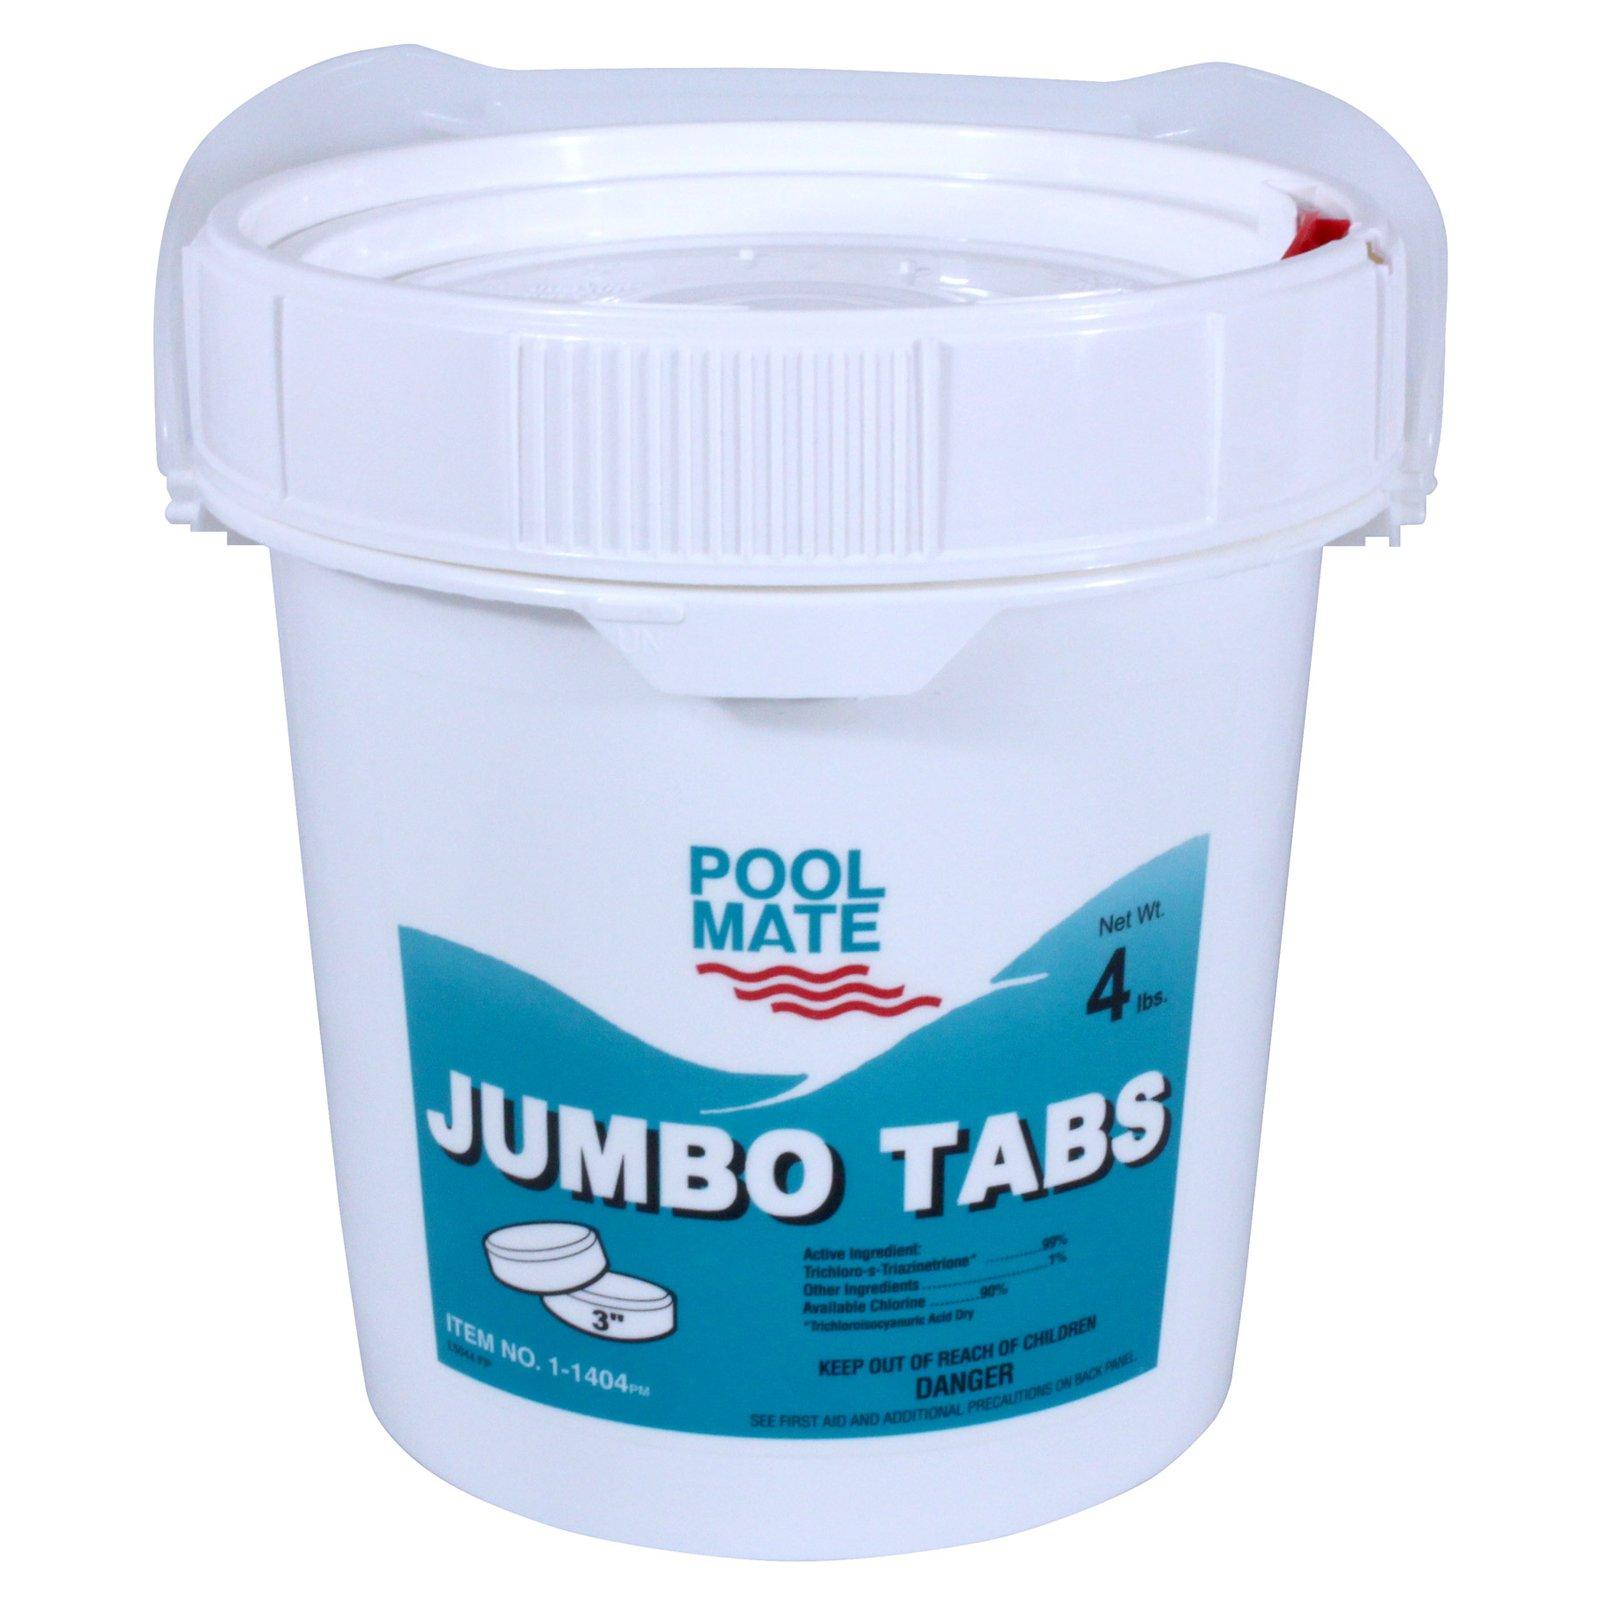 Pool Mate Chlorine Jumbo Tabs Swimming Pool Chlorine Pool Cleaning Swimming Pools